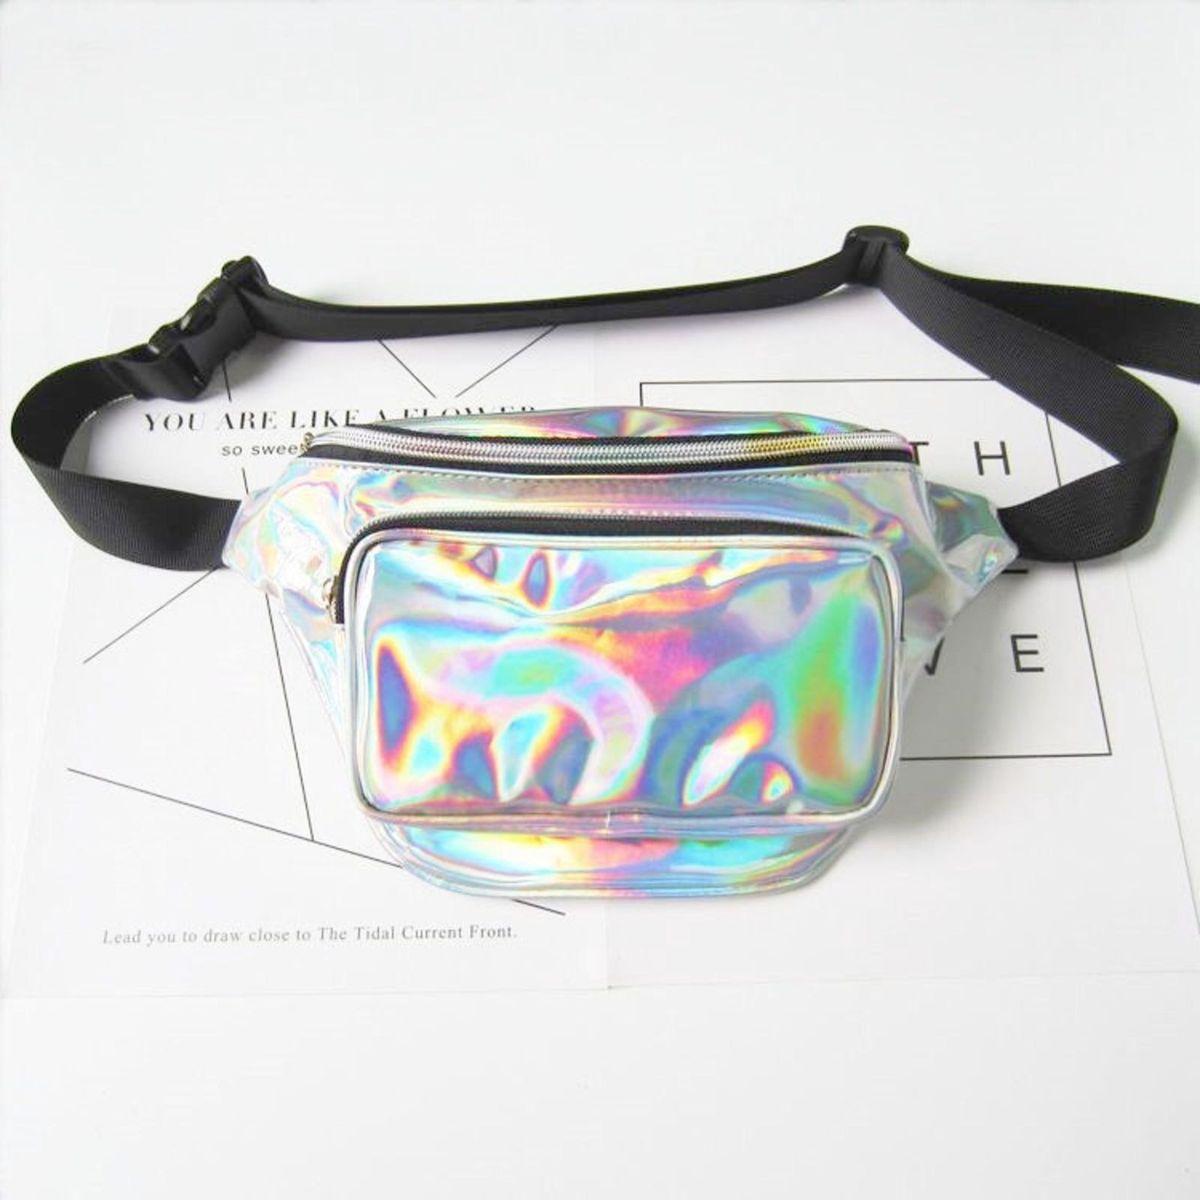 pochete vinil holográfica - ombro sem marca